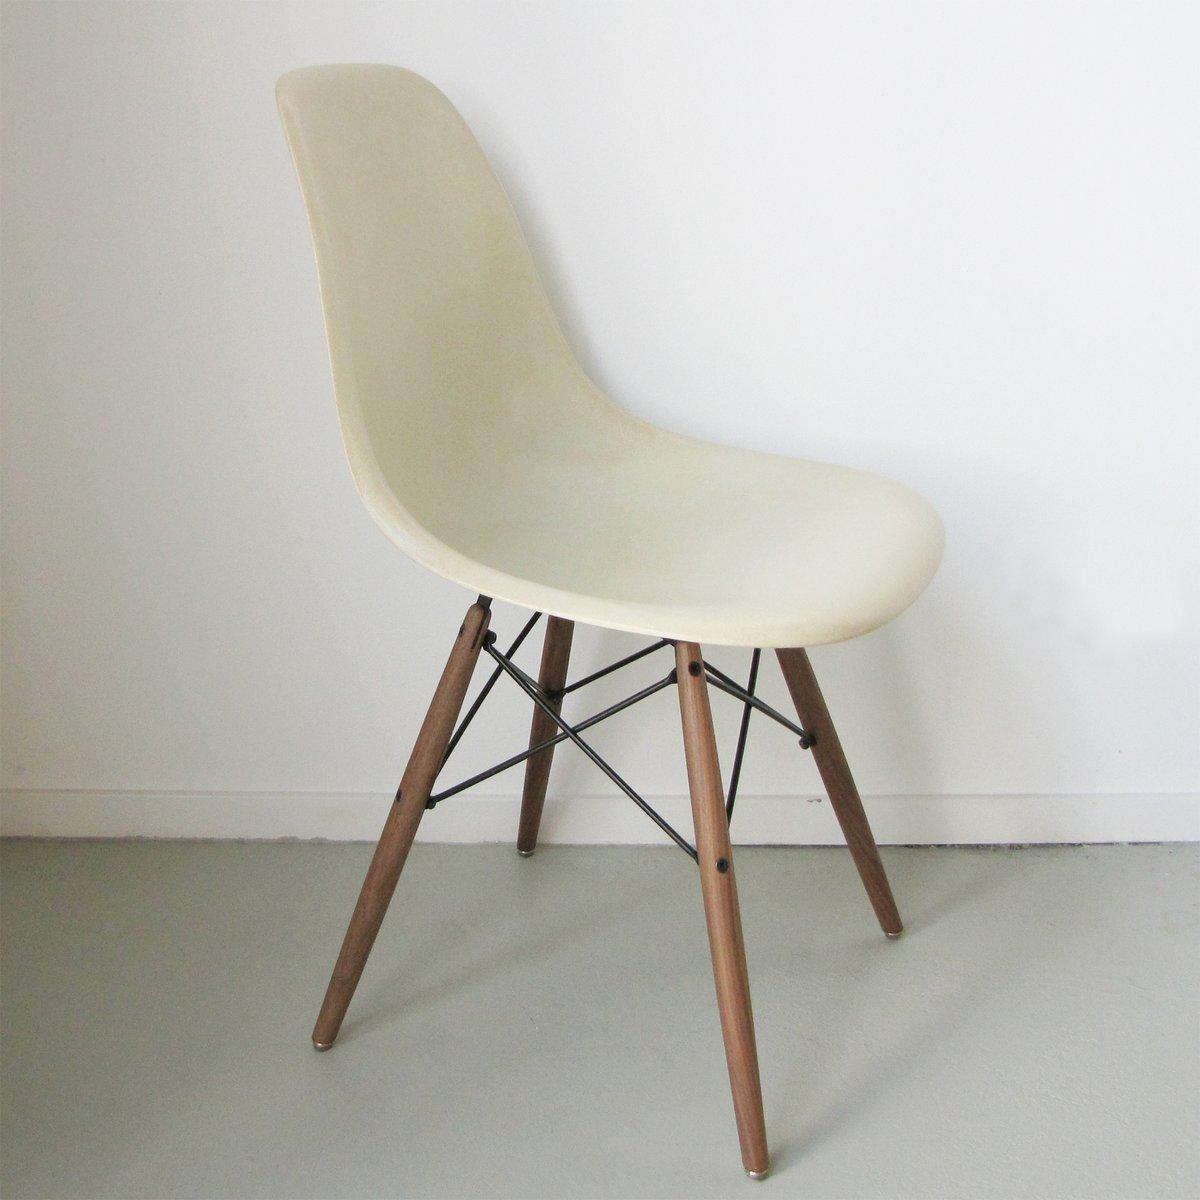 dsw stuhl von charles ray eames f r herman miller 1962 bei pamono kaufen. Black Bedroom Furniture Sets. Home Design Ideas